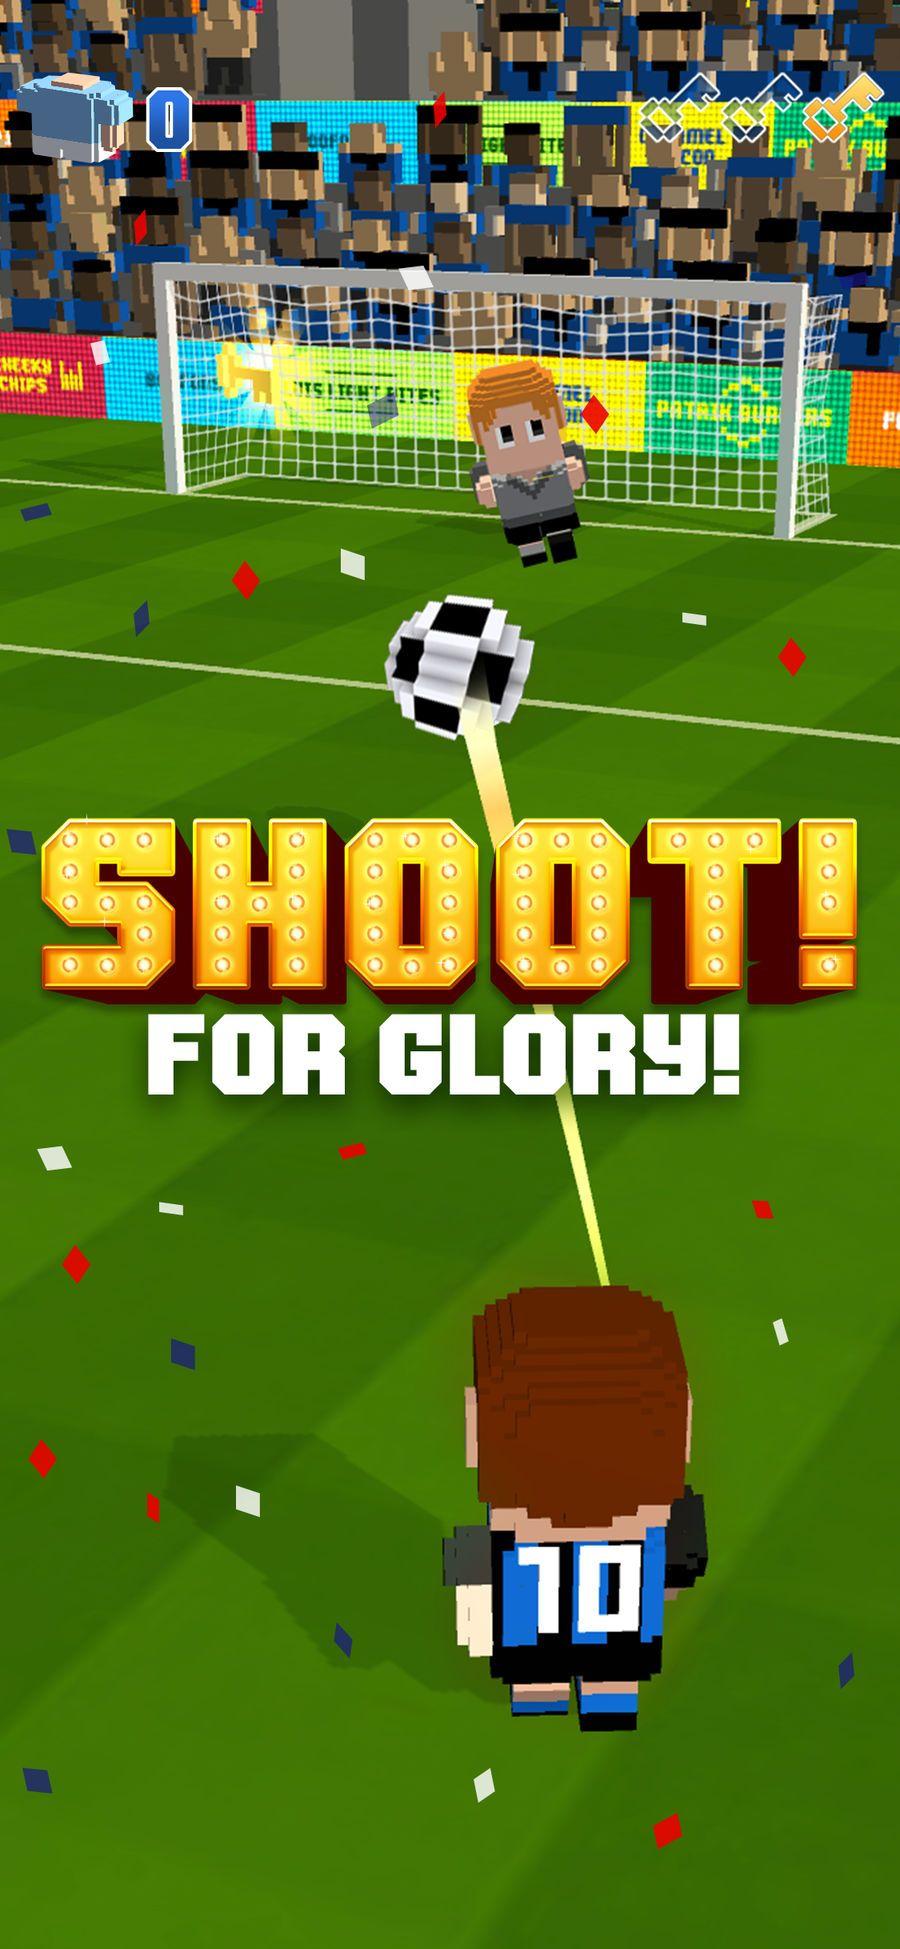 Blocky Soccer ArcadeSportsappsios Soccer, Group